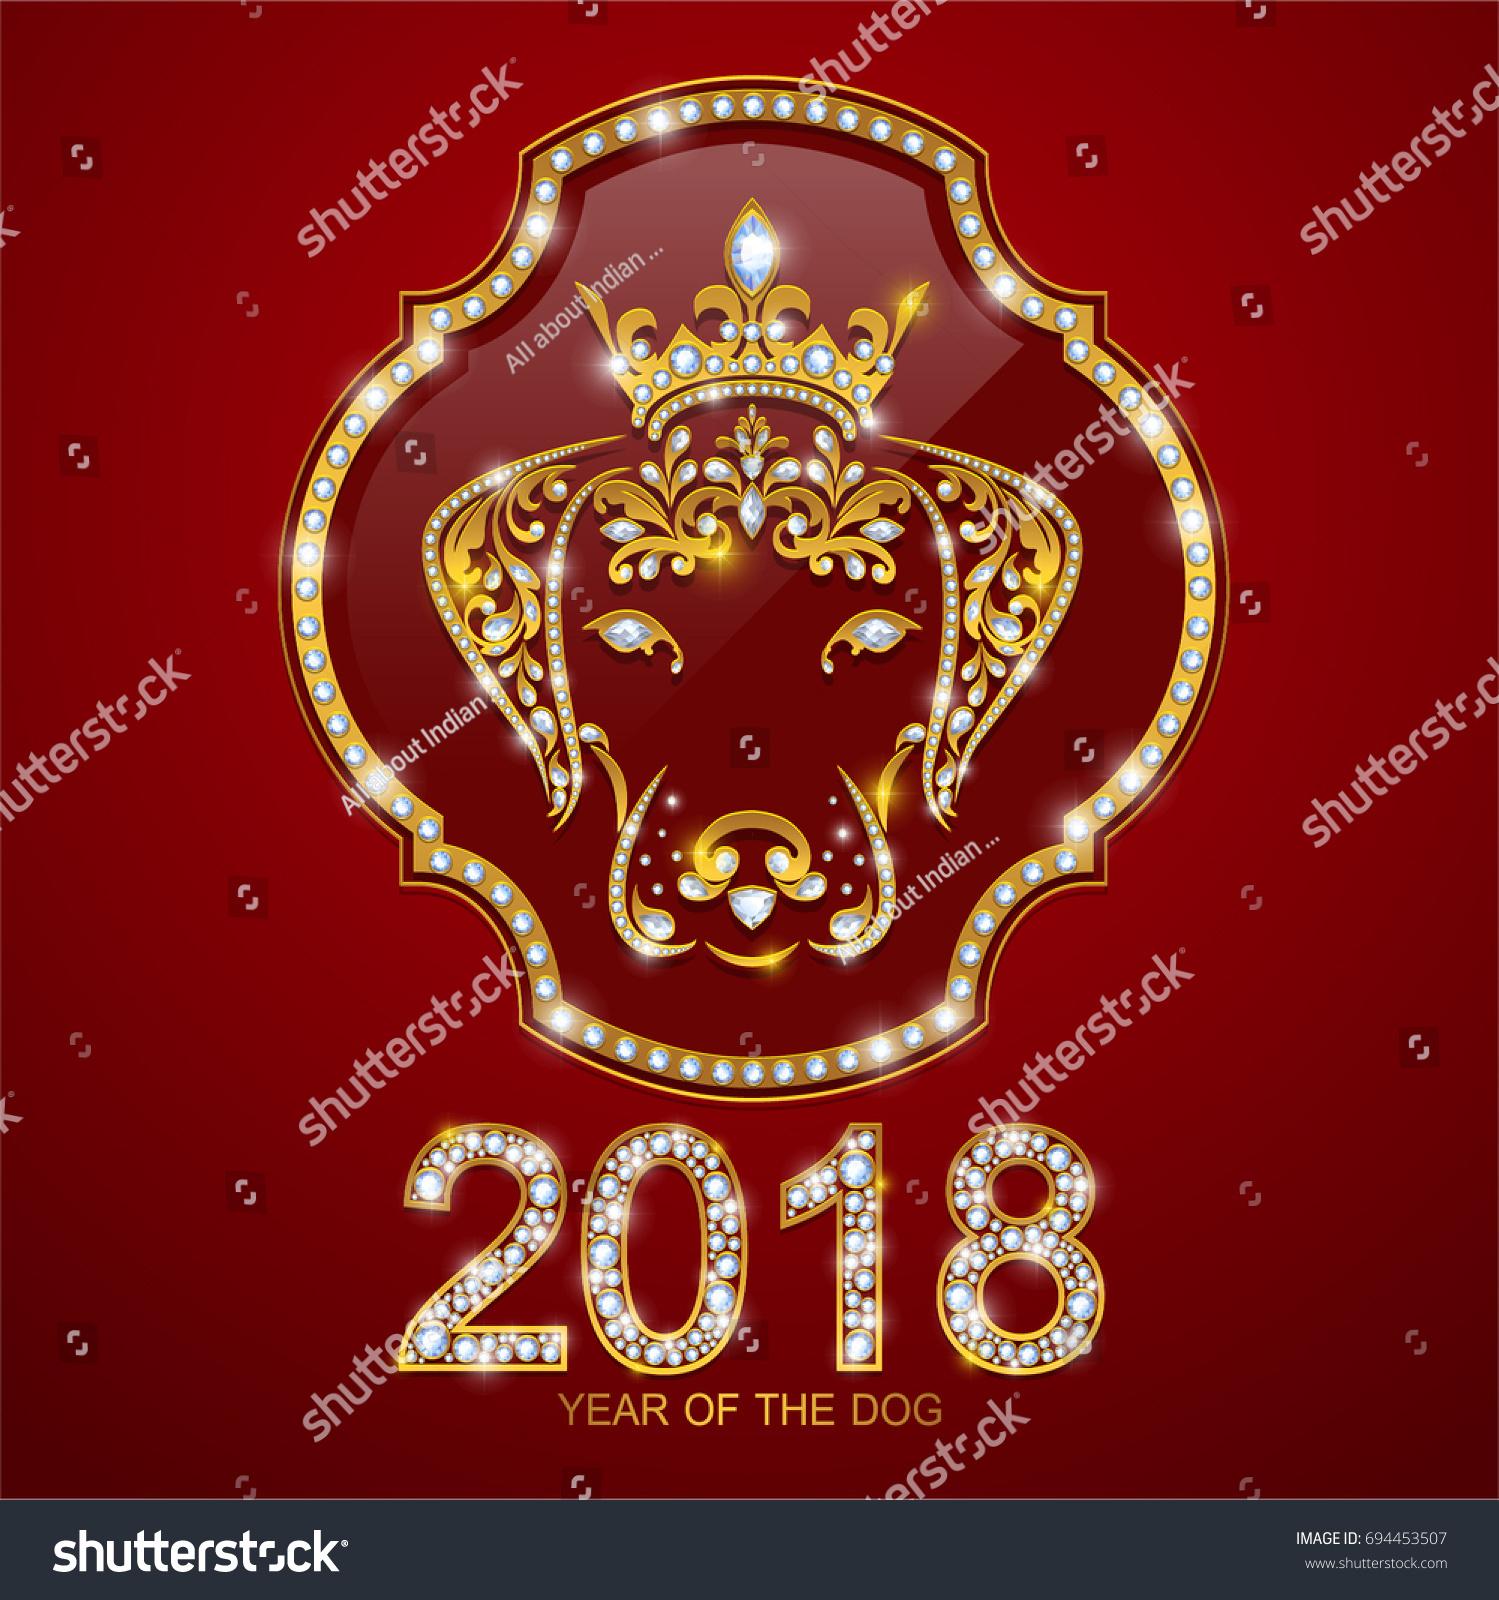 Dog year chinese zodiac symbol new stock vector 694453507 dog of the year chinese zodiac symbol new year 2018 with gold patterned and crystals buycottarizona Images